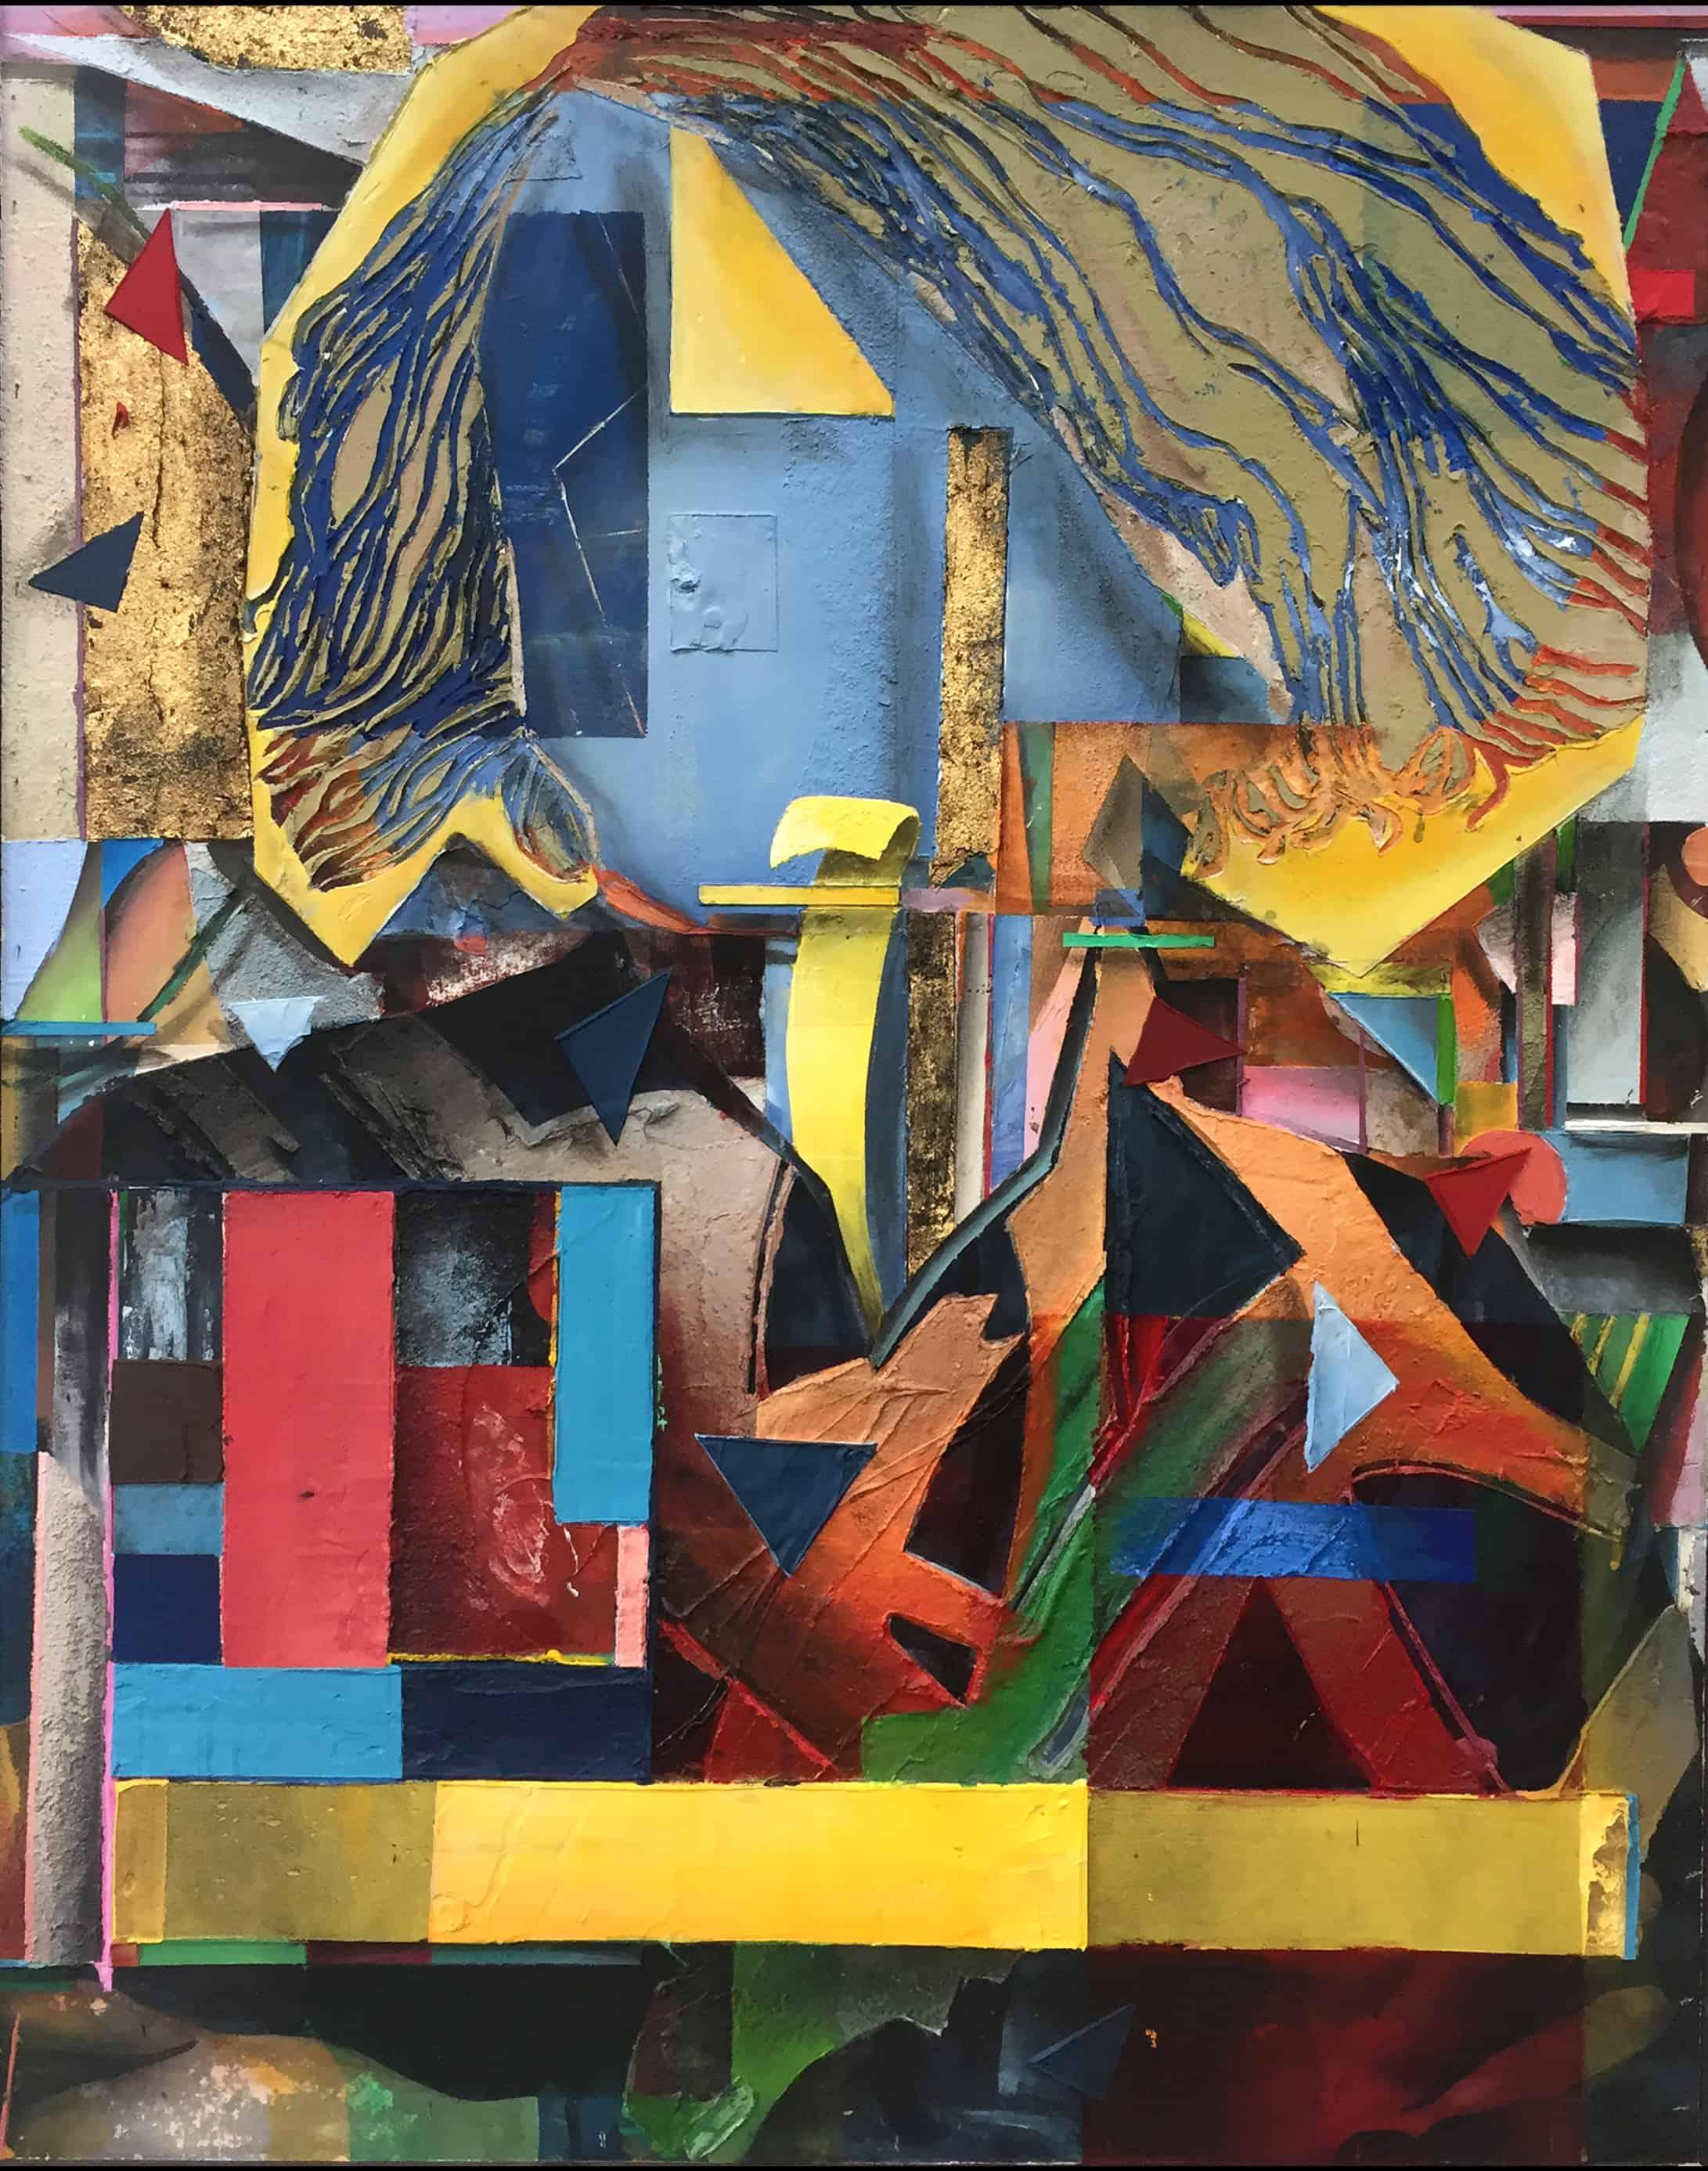 Michel Houellebecq 99x80 cm acrylics, sand, plaster on canvas on wood panel